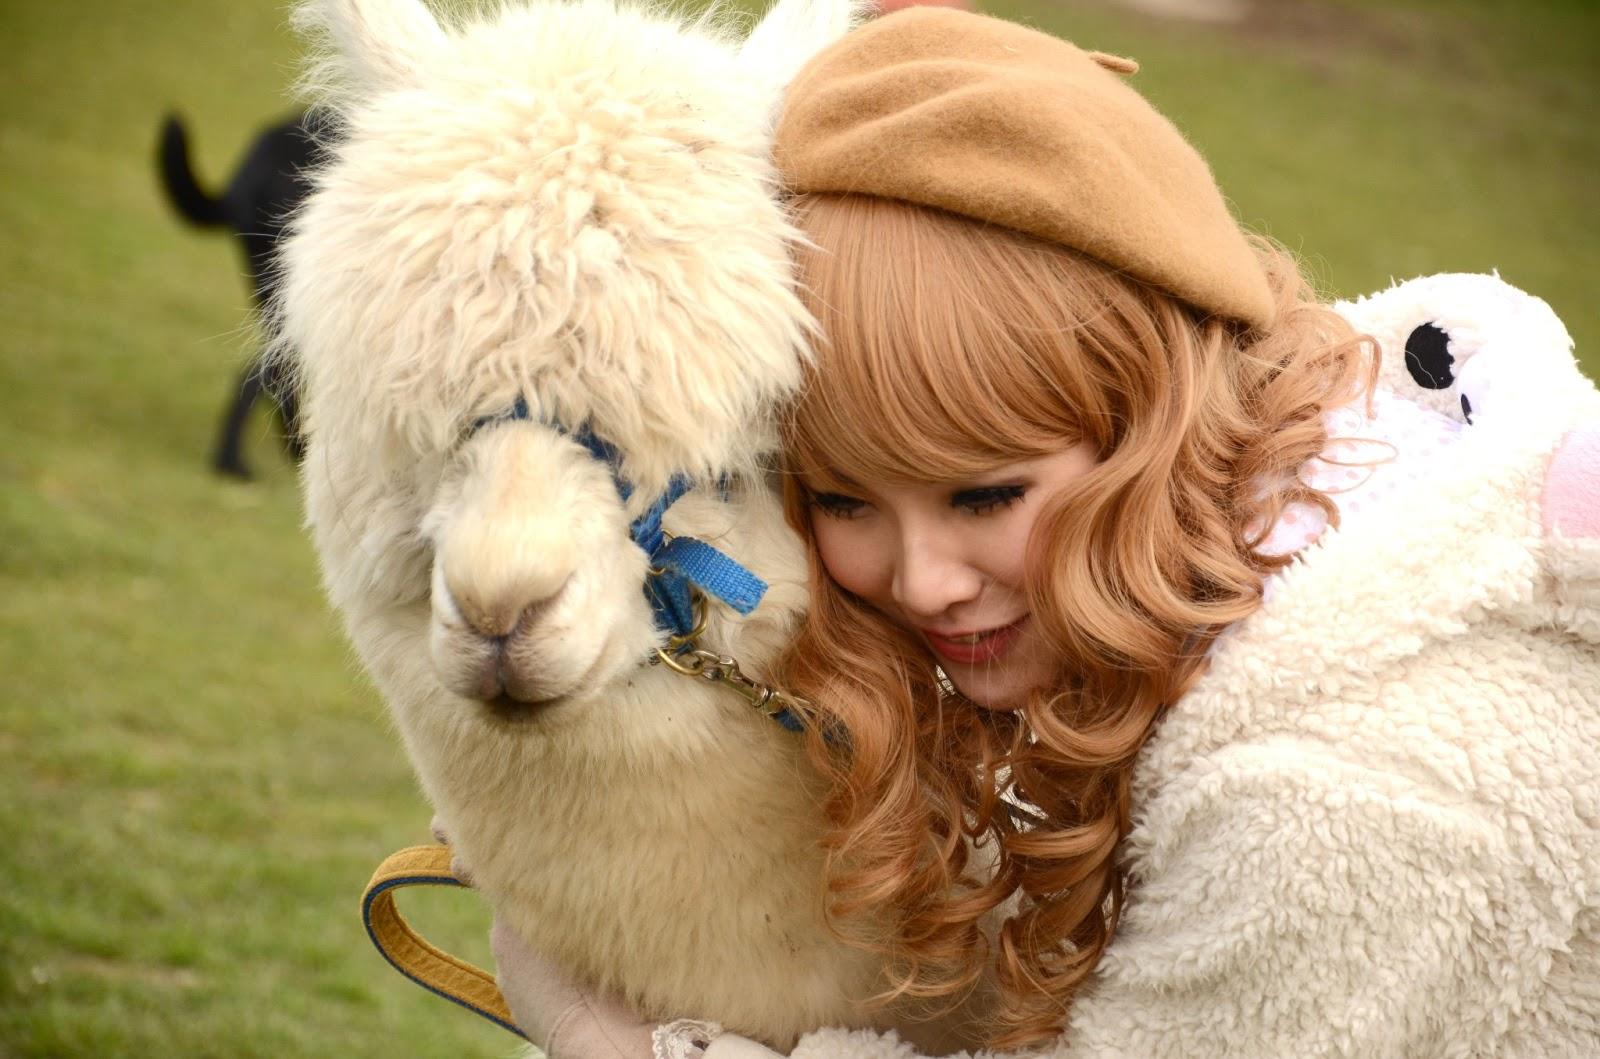 WildLife: Alpaca Little Cute Animal